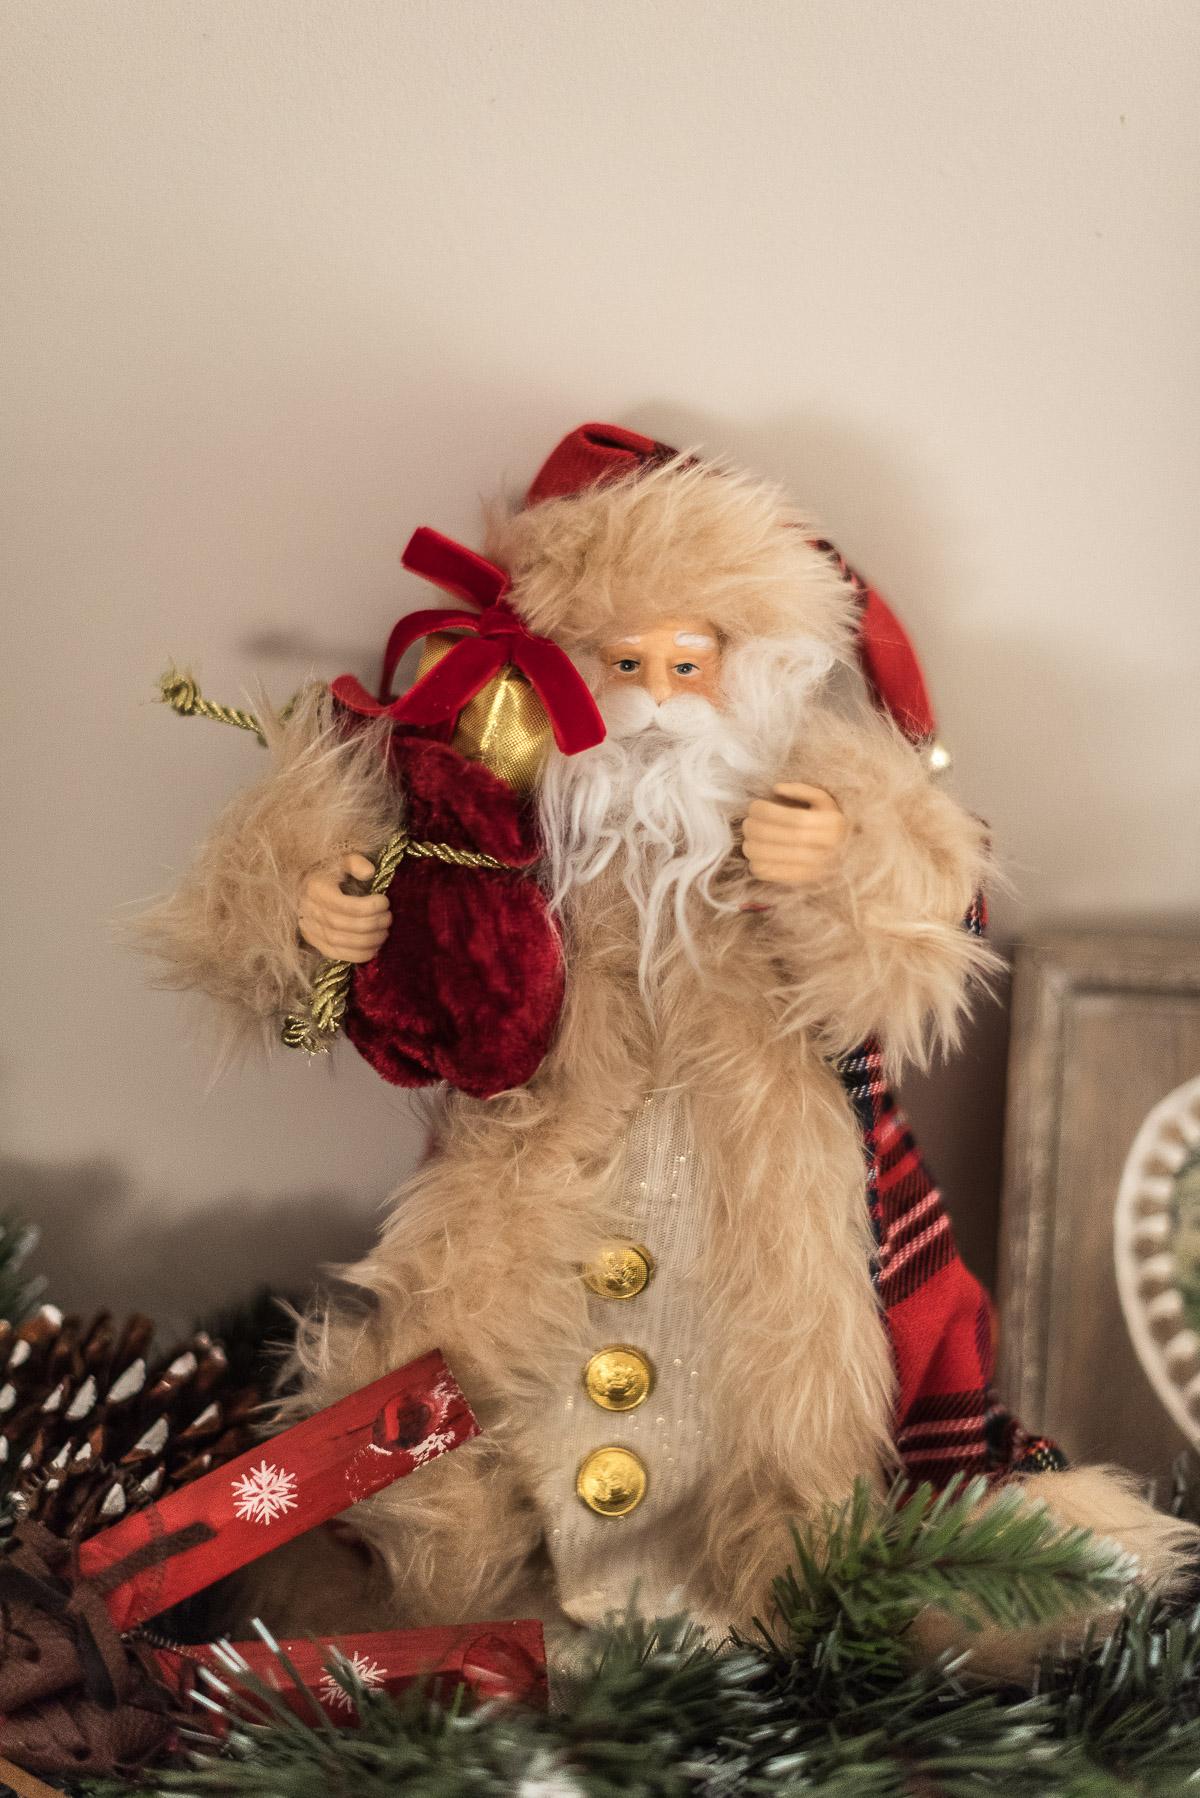 Santa Claus Tree topper, Asda